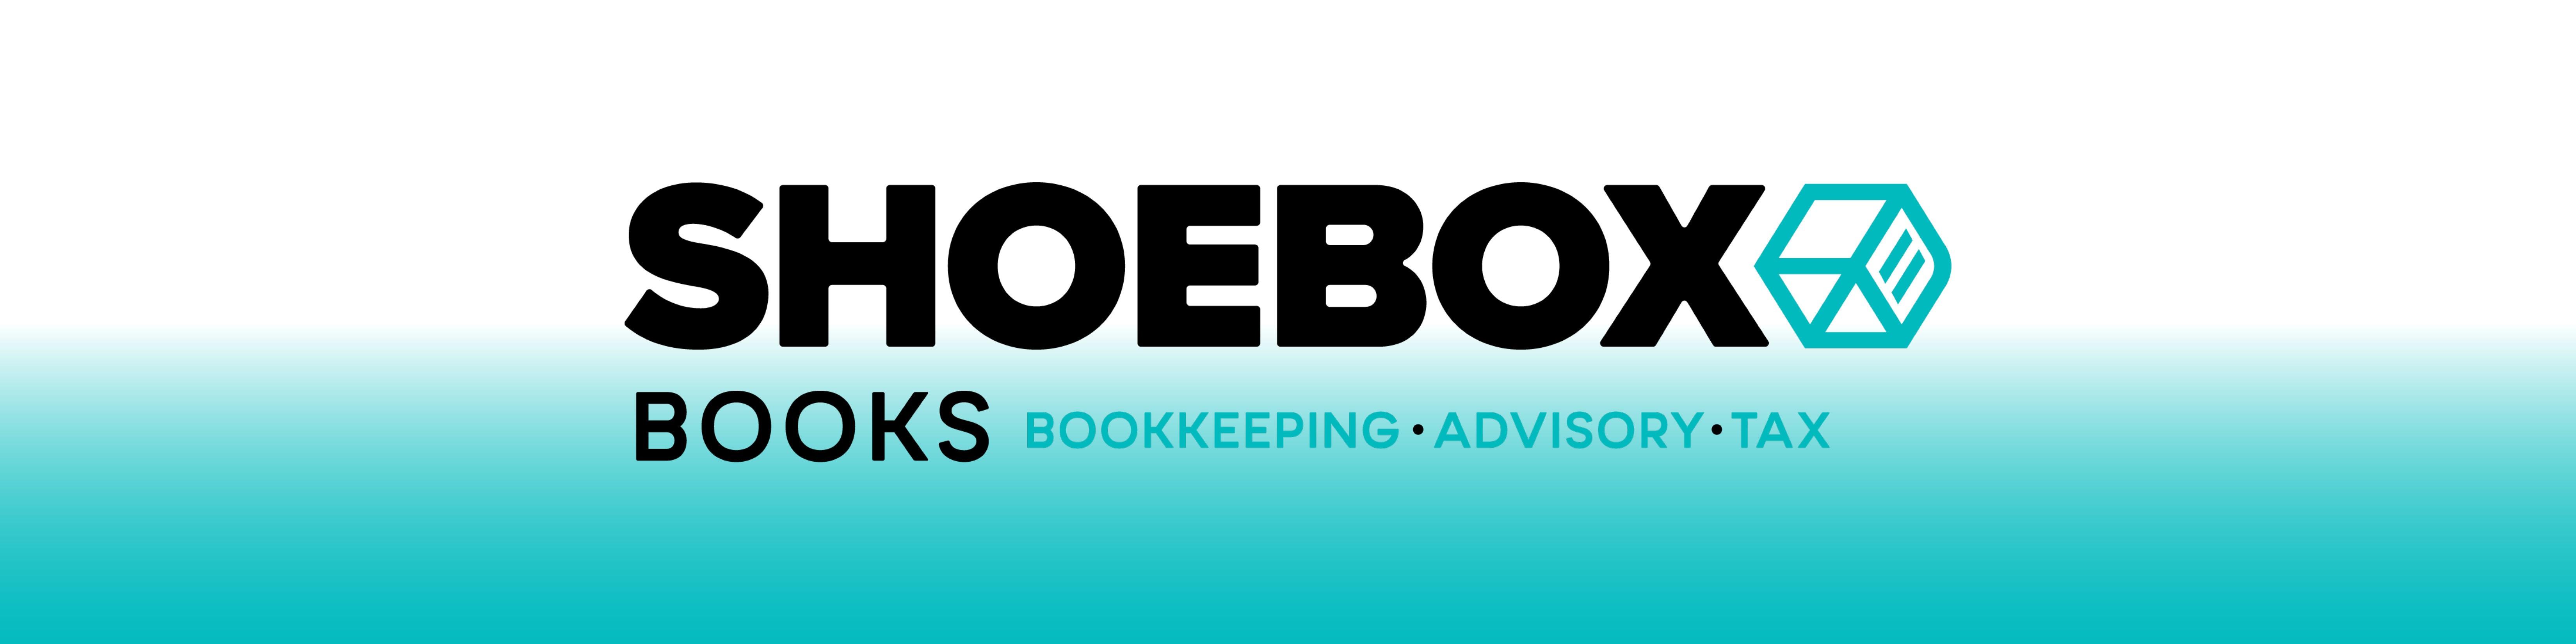 Shoebox Books | LinkedIn